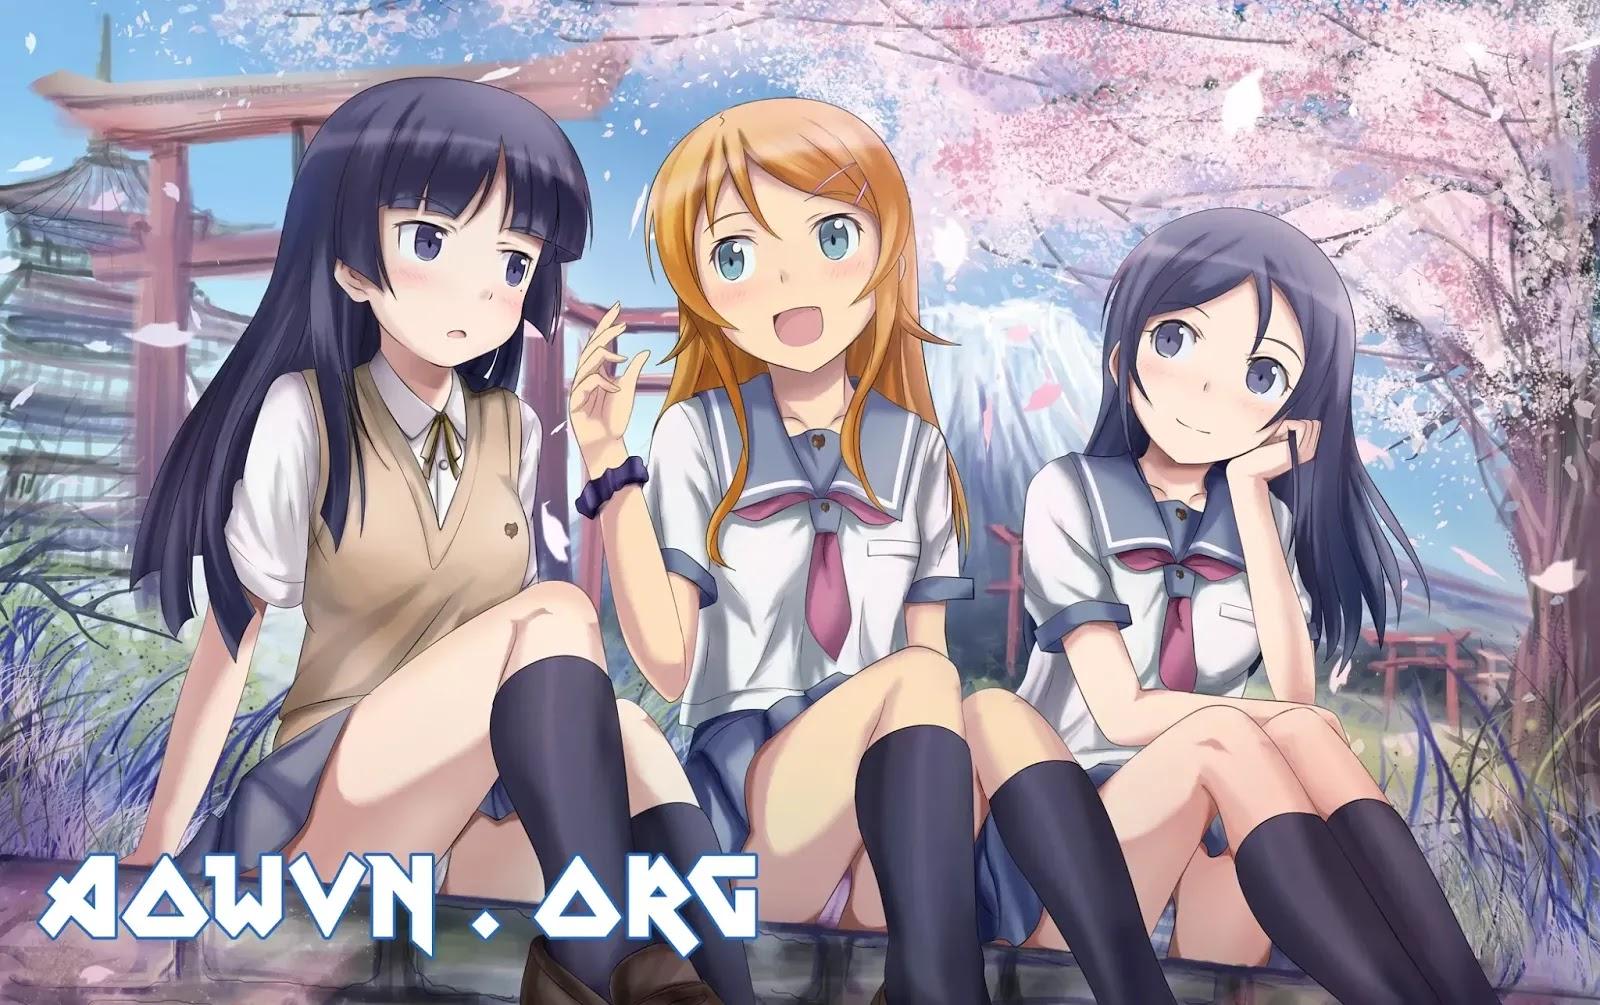 AowVN.org min%2B%25281%2529 - [ Anime 3gp Mp4 ] Ore No Imouto Ga Konna Ni Kawaii Wake Ga Nai BD SS1 + SS2 + Specials | Vietsub - Tình Cảm Đời Thường Hay